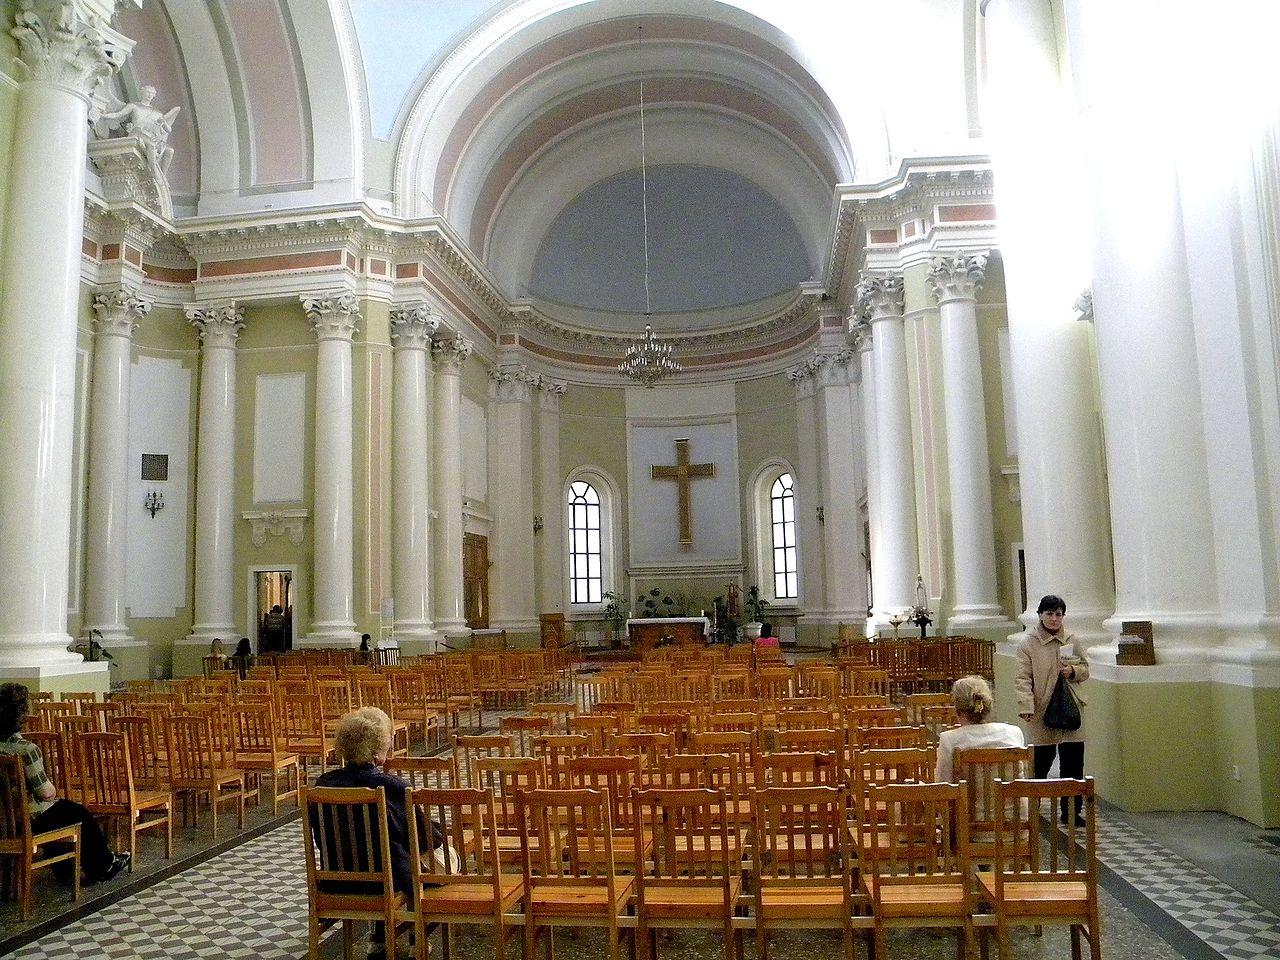 Интерьер церкви. Автор: Foma, Wikimedia Commons